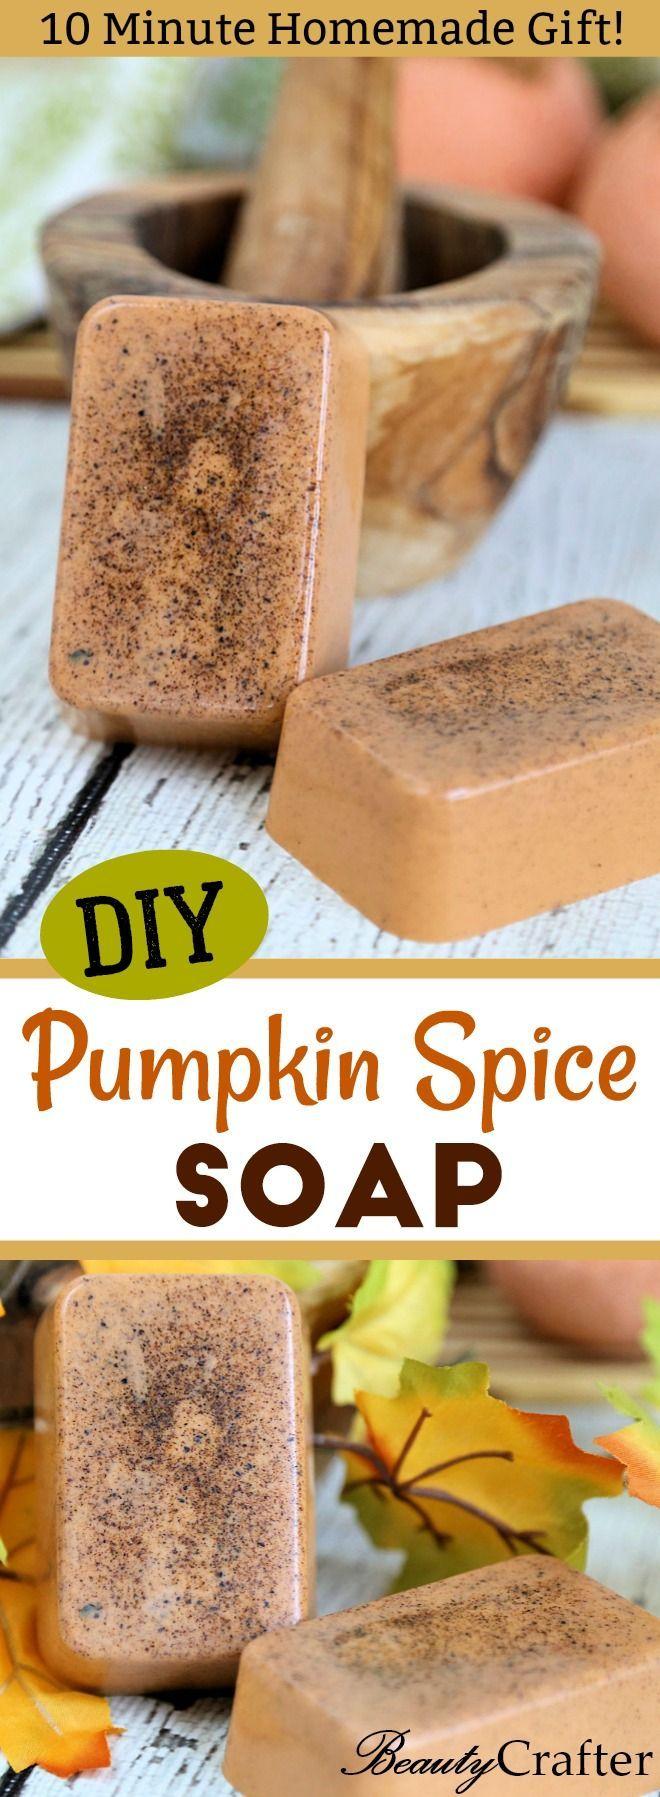 Pumpkin Spice Soap Recipe, Easy Fall Craft, Great DIY Gift! Get your Pumpkin Spi…